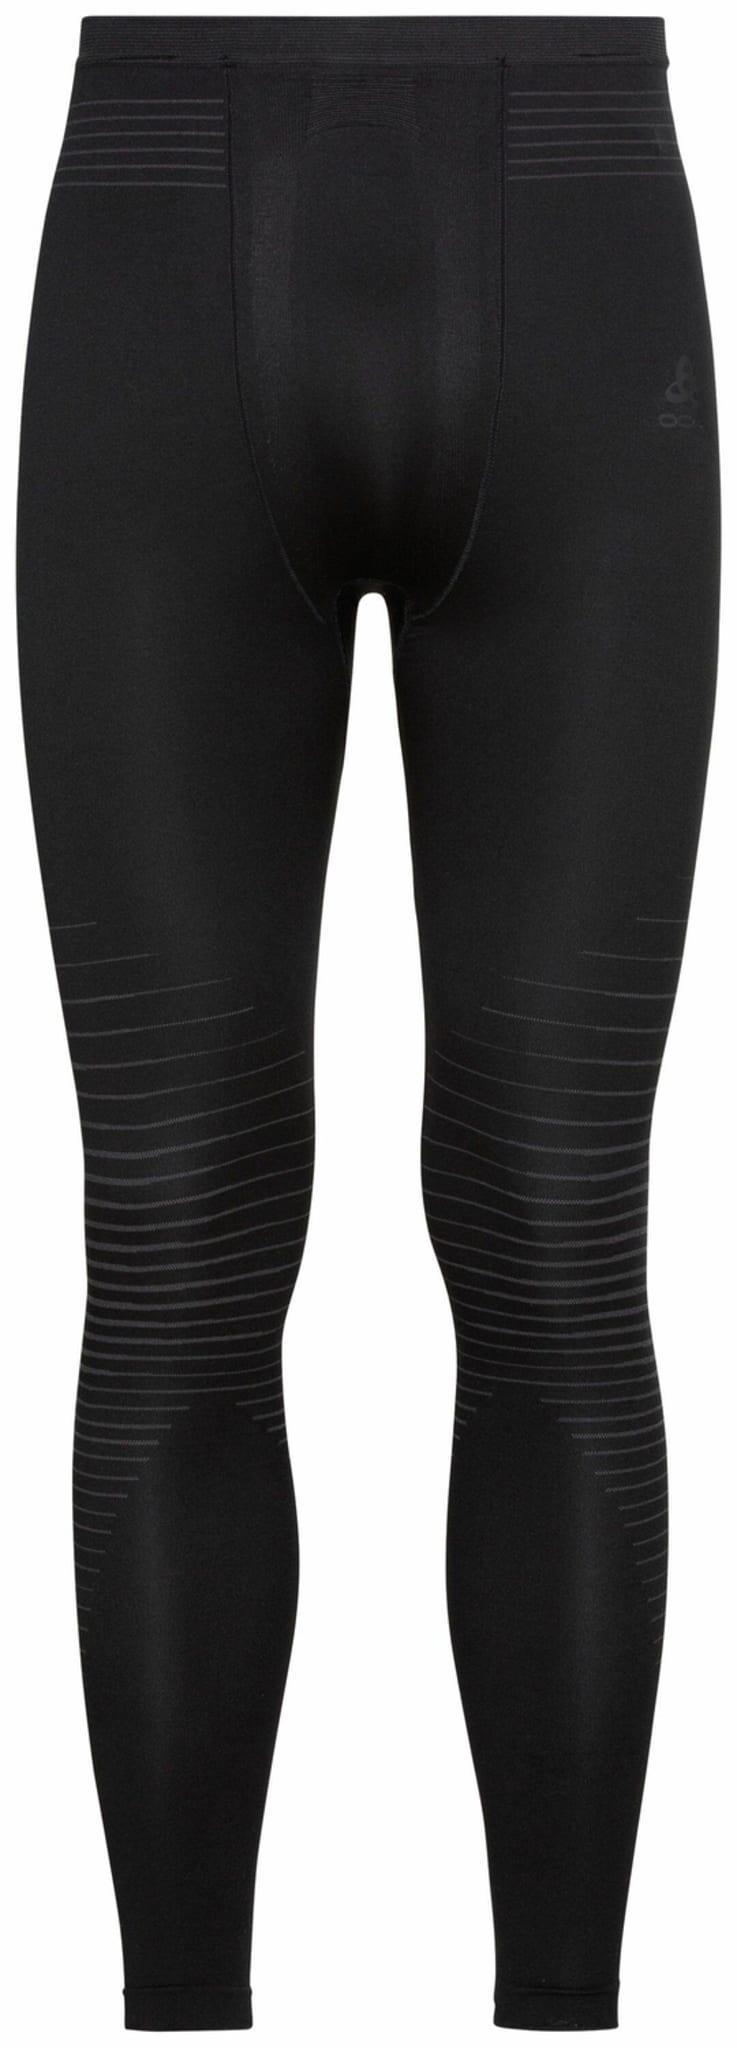 Performance Light Base Layer Pants